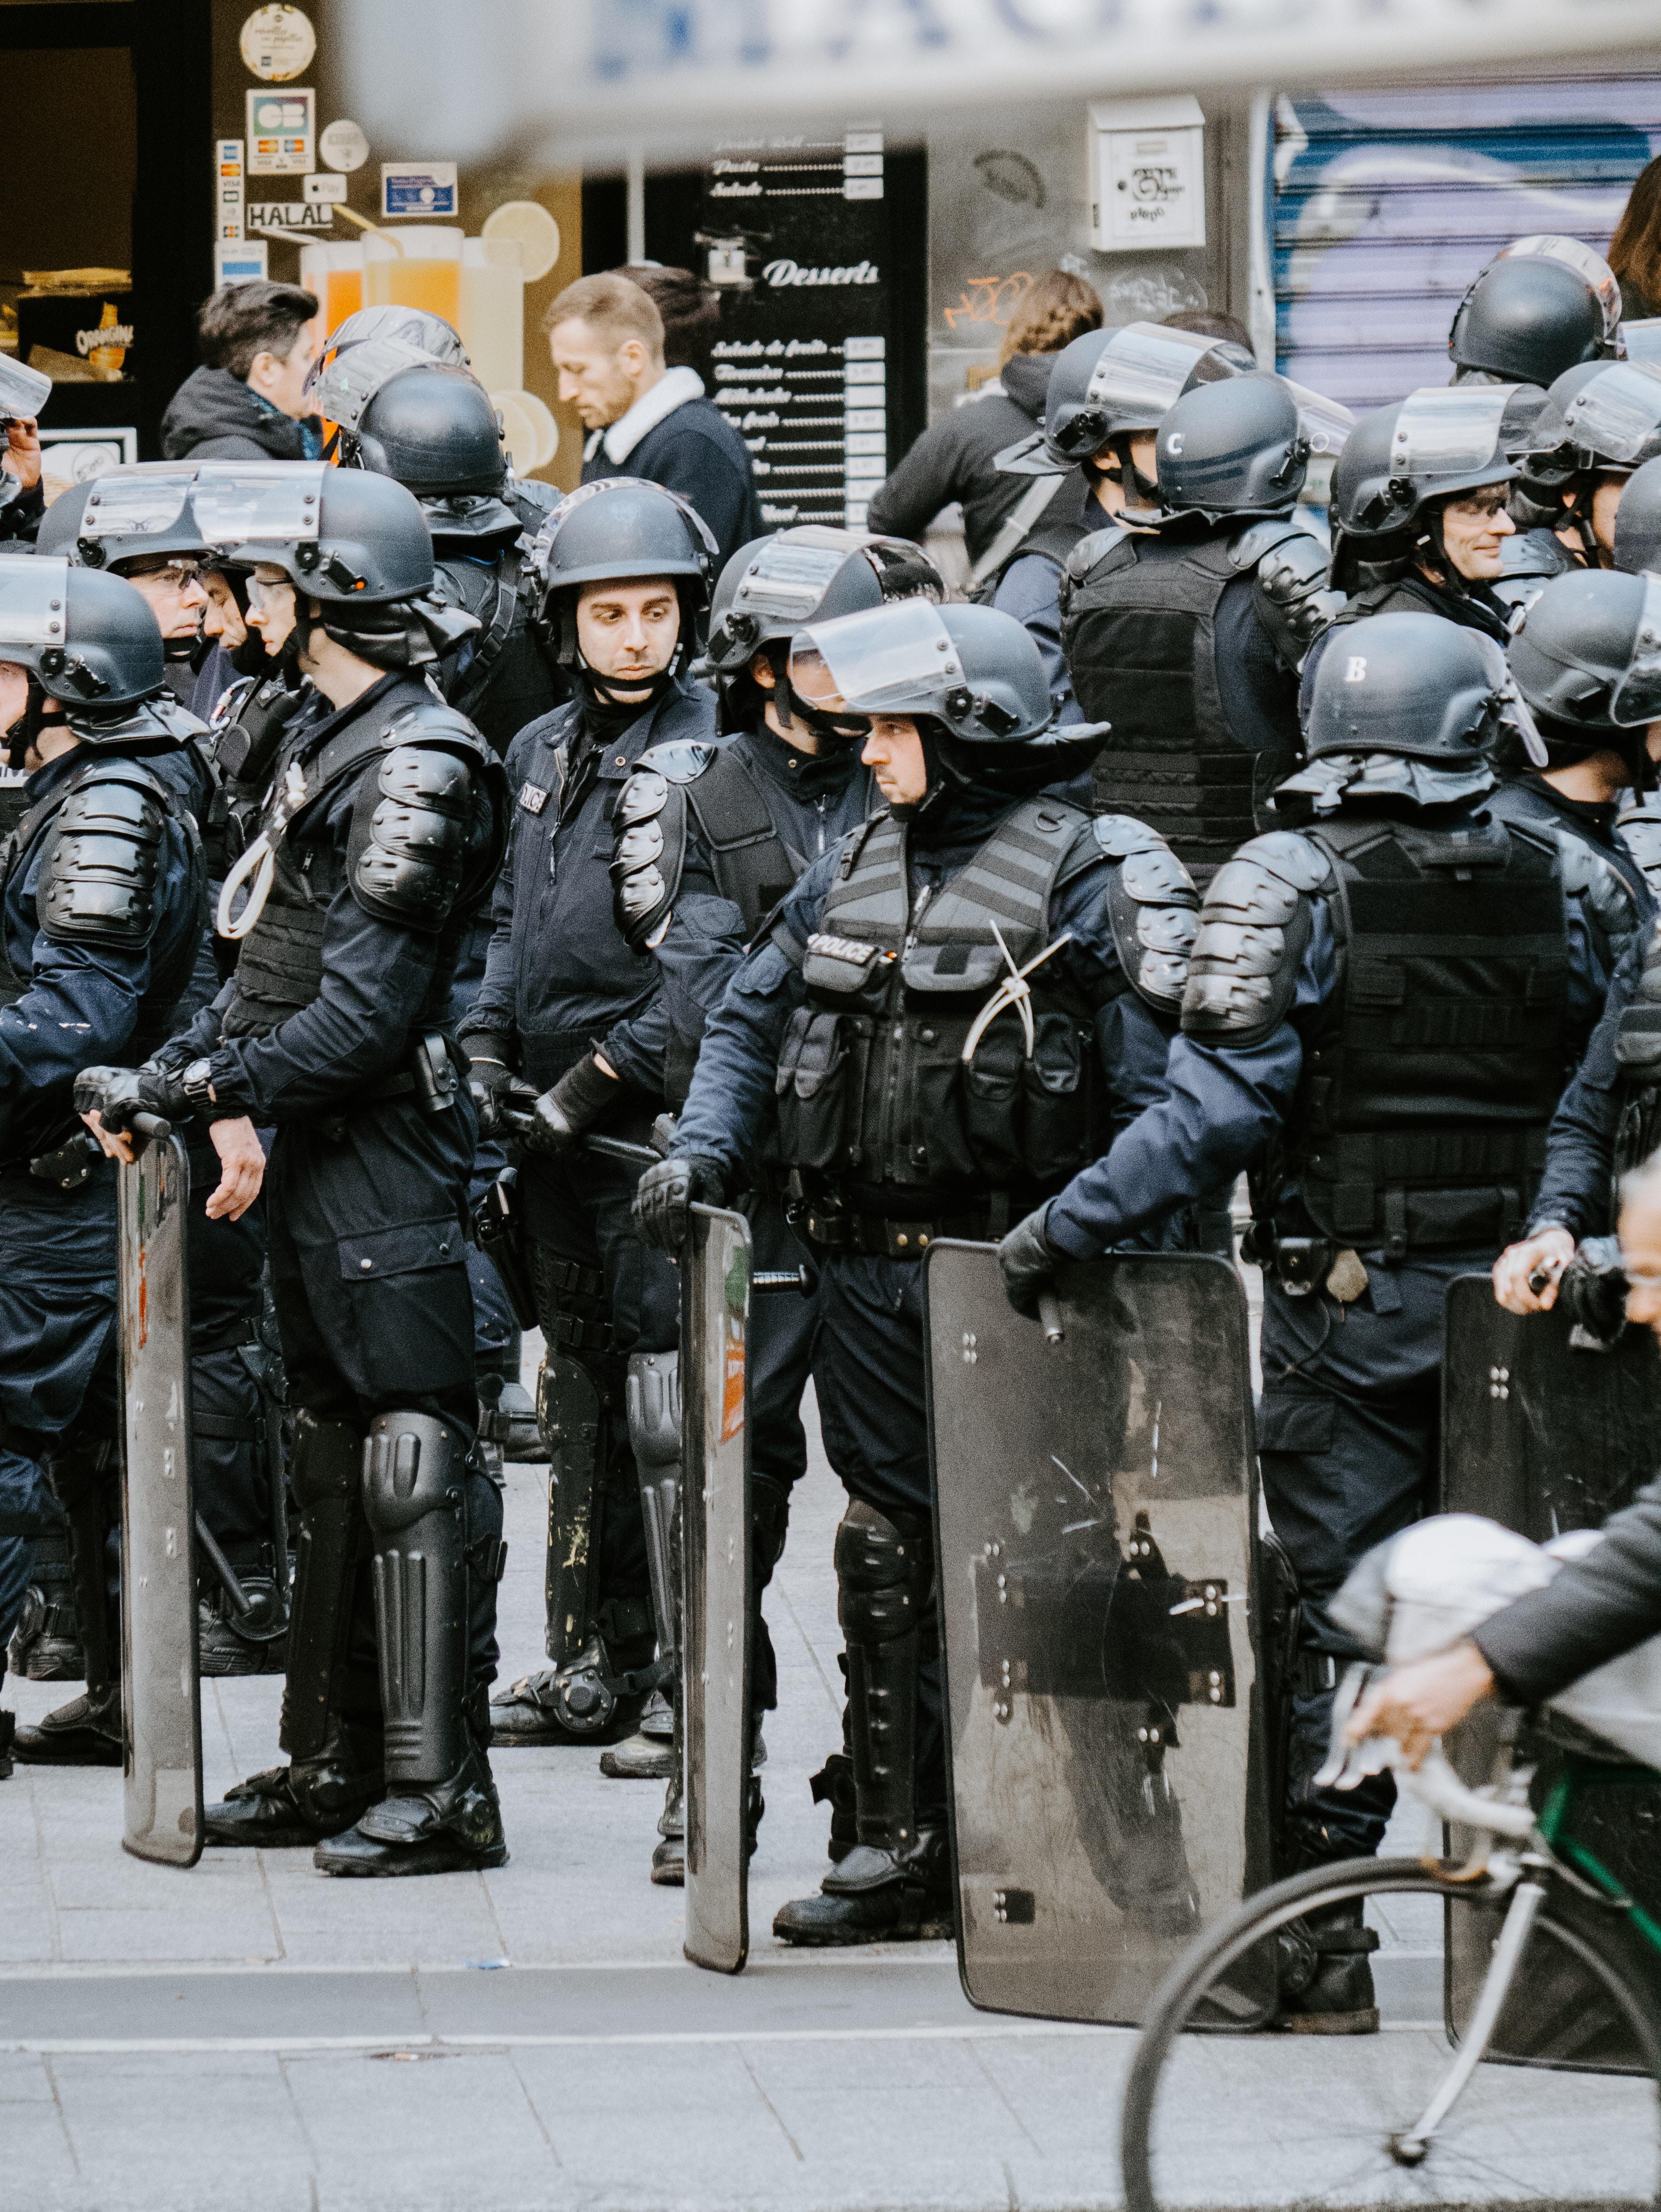 parisisk politi (Foto: Unsplash)